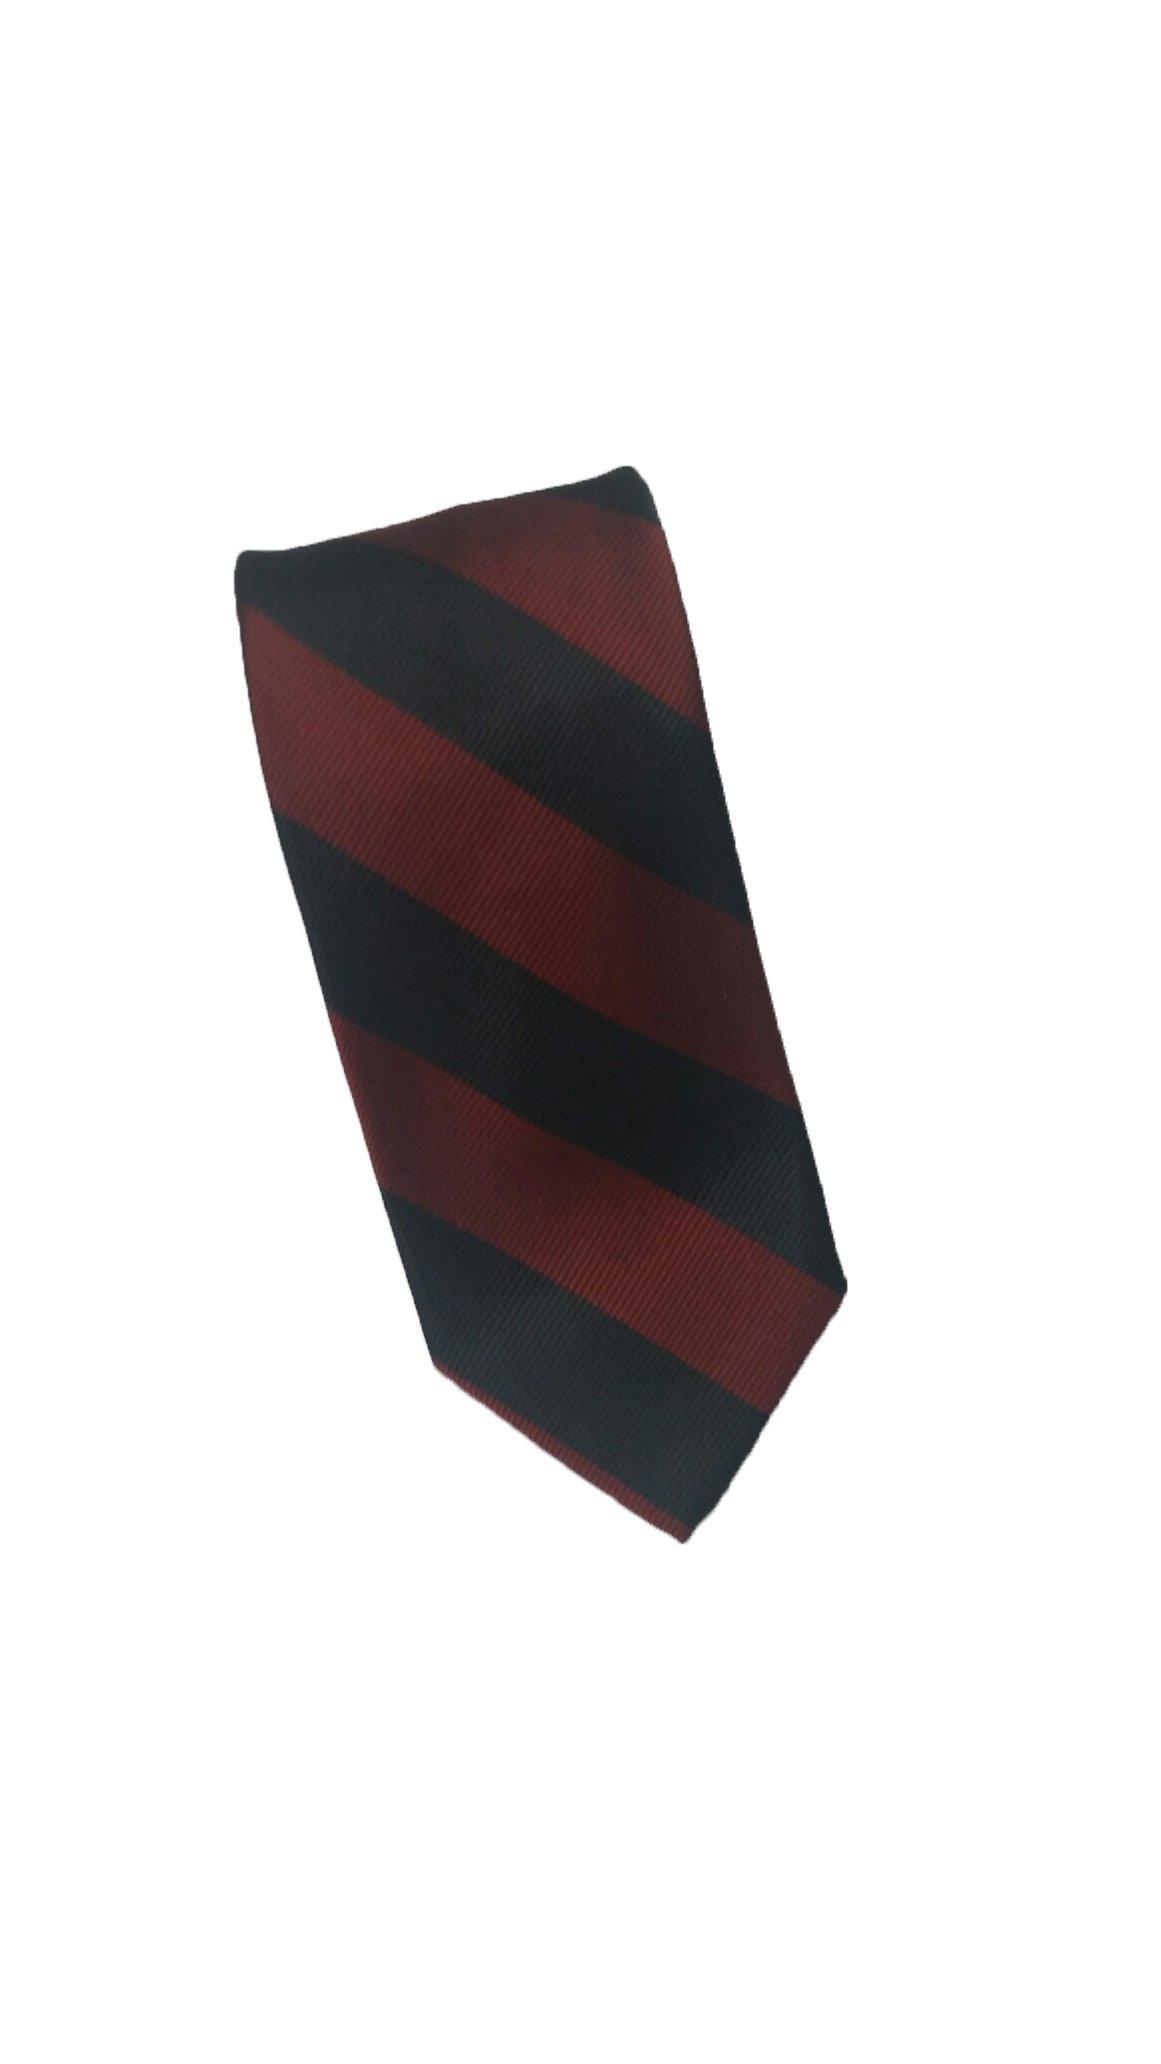 Robert Talbott Burgundy and Black Stripes Silk Tie